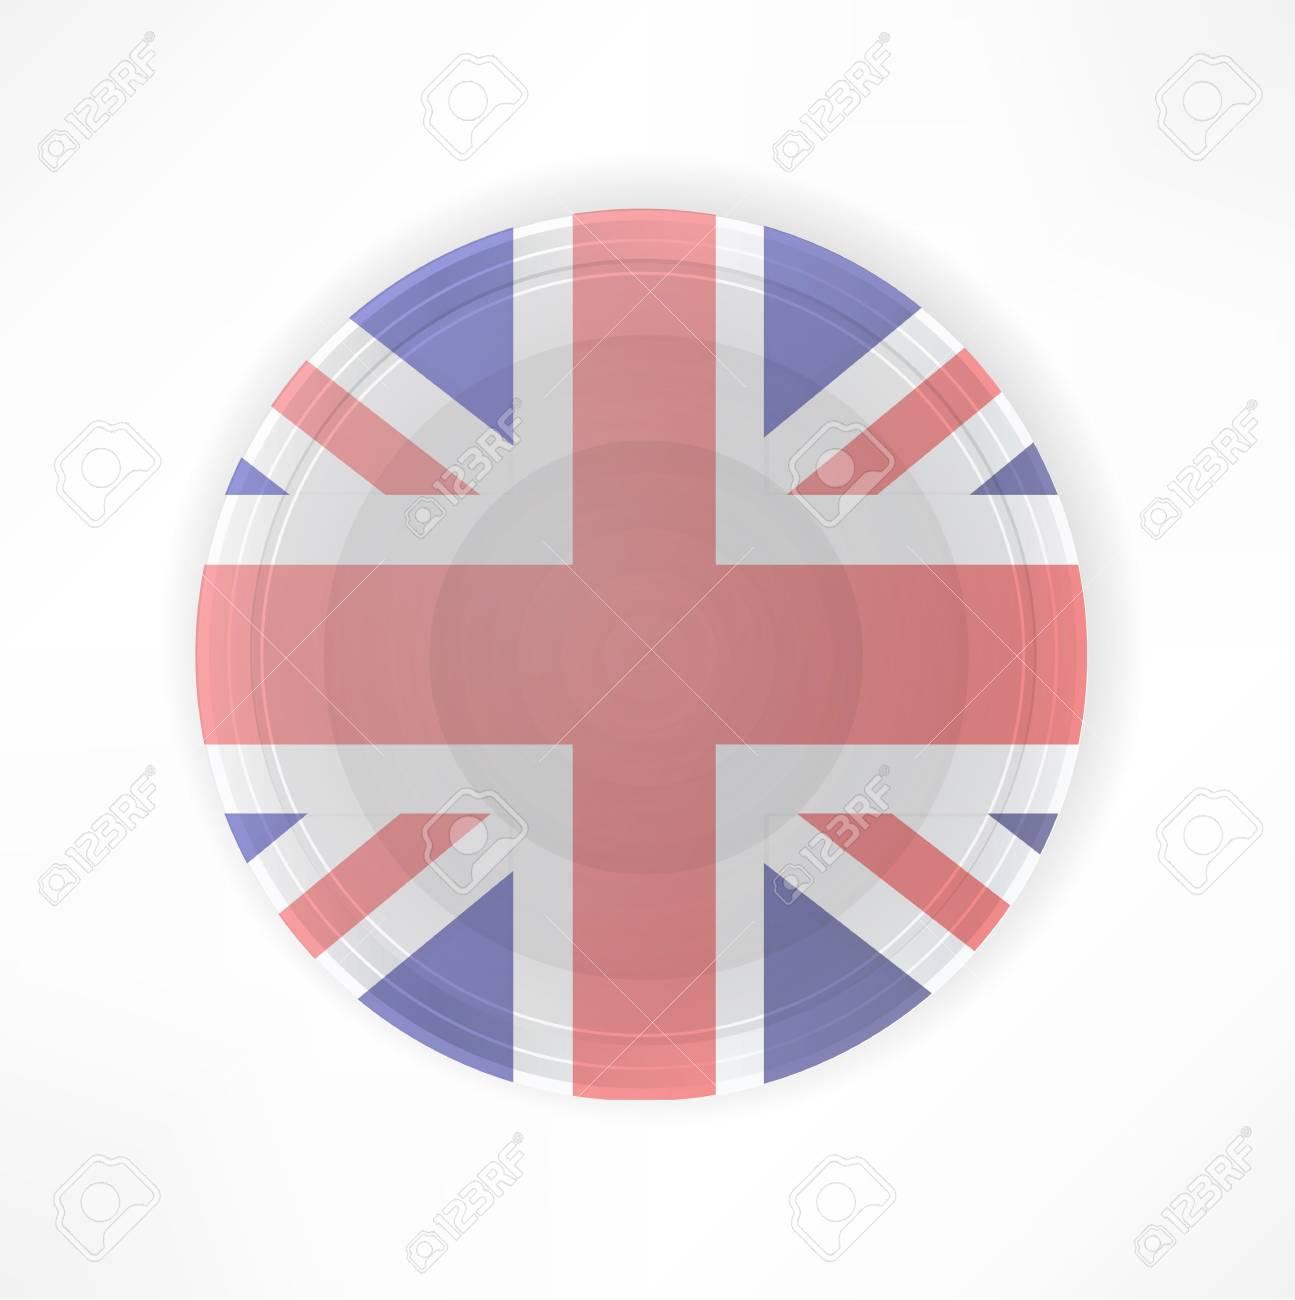 Traditional London Restaurants Stock Vector - 17945580